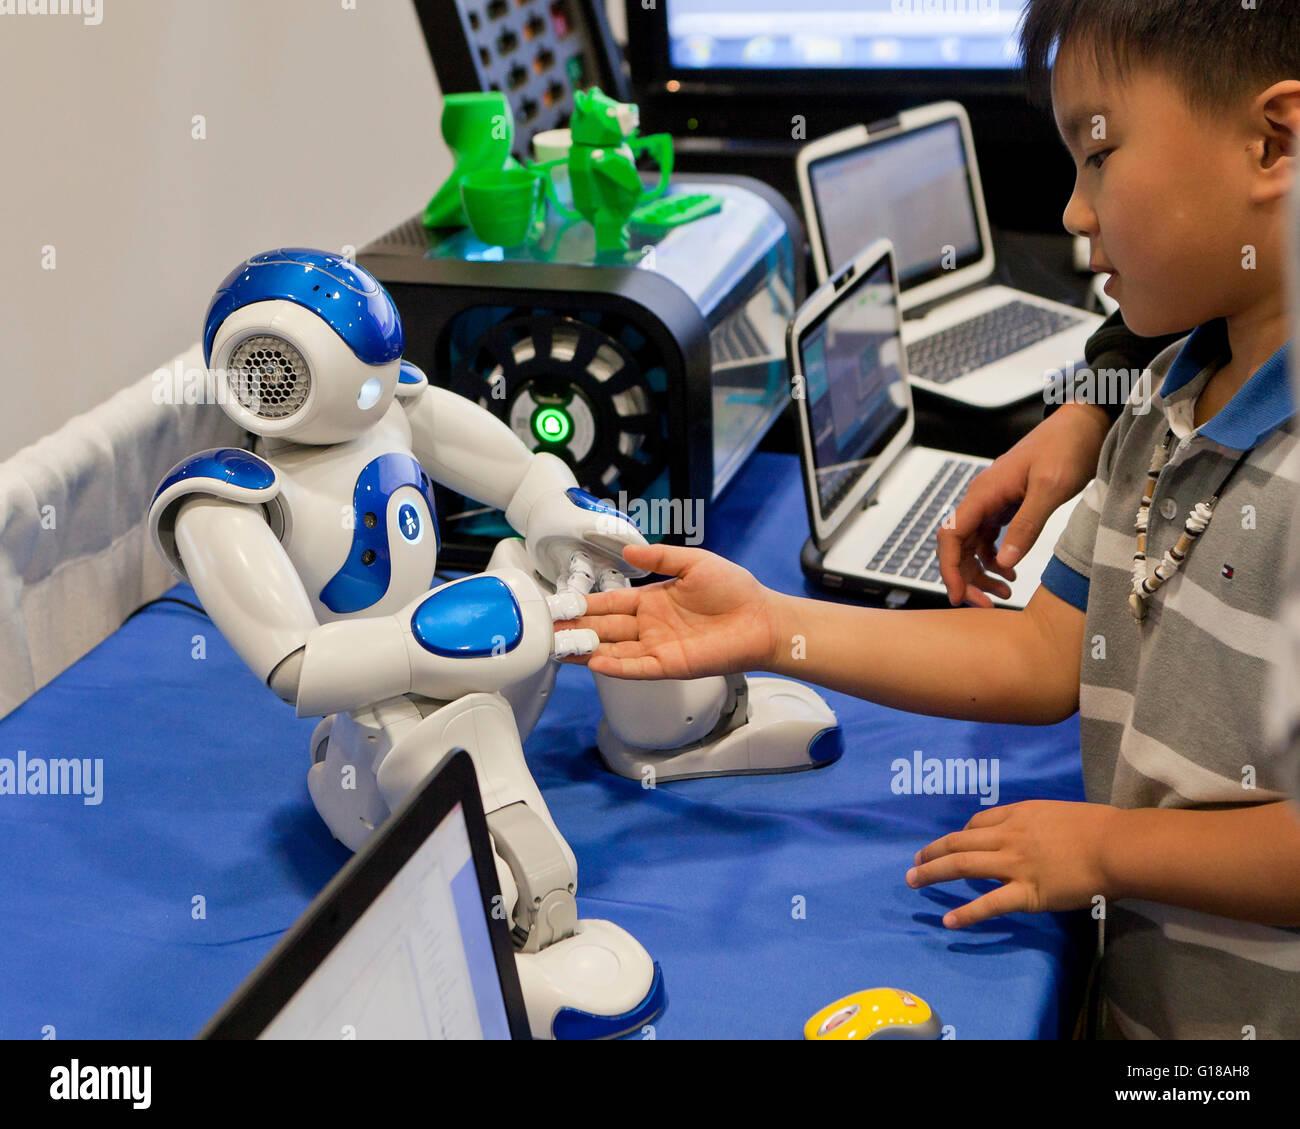 Bambino interagendo con robot umanoide a Science and Engineering Fair - USA Immagini Stock